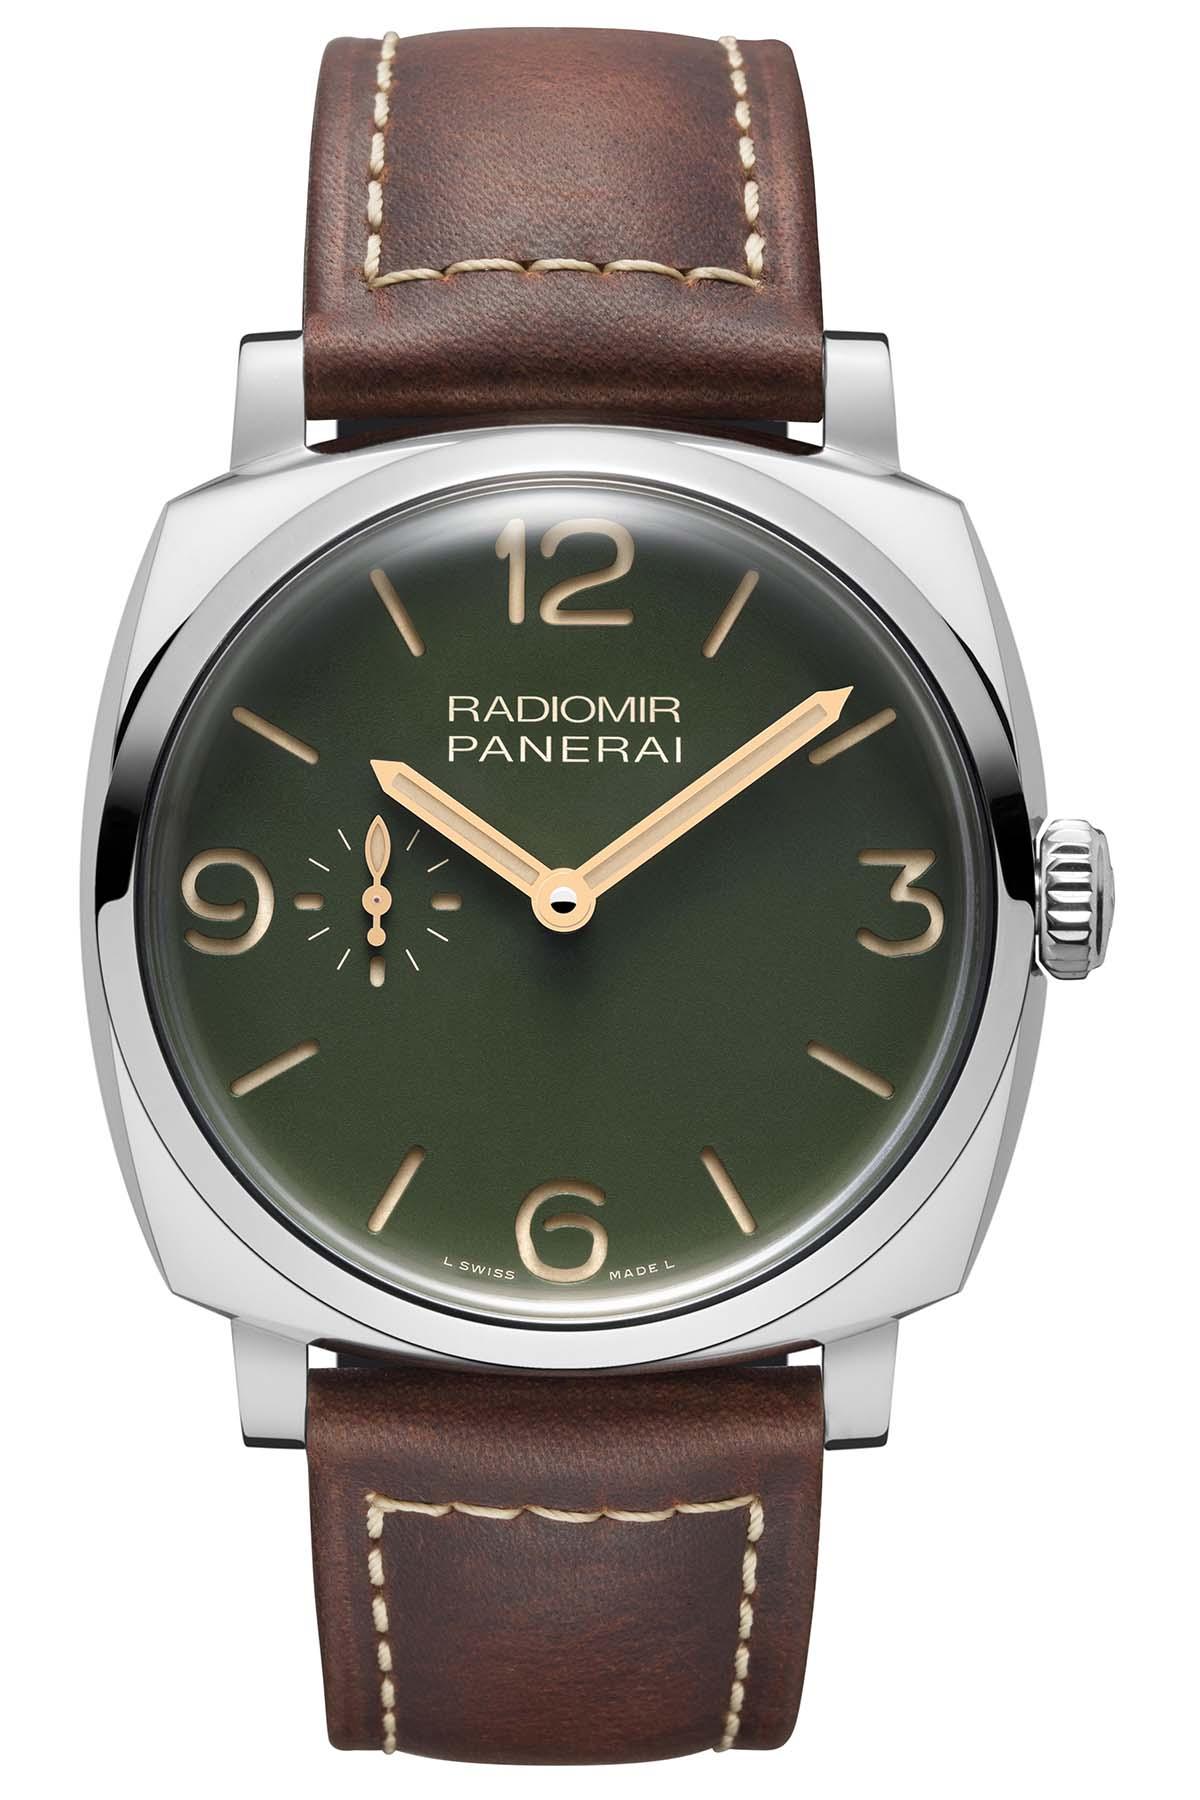 Panerai Radiomir 1940 45mm military green PAM00995